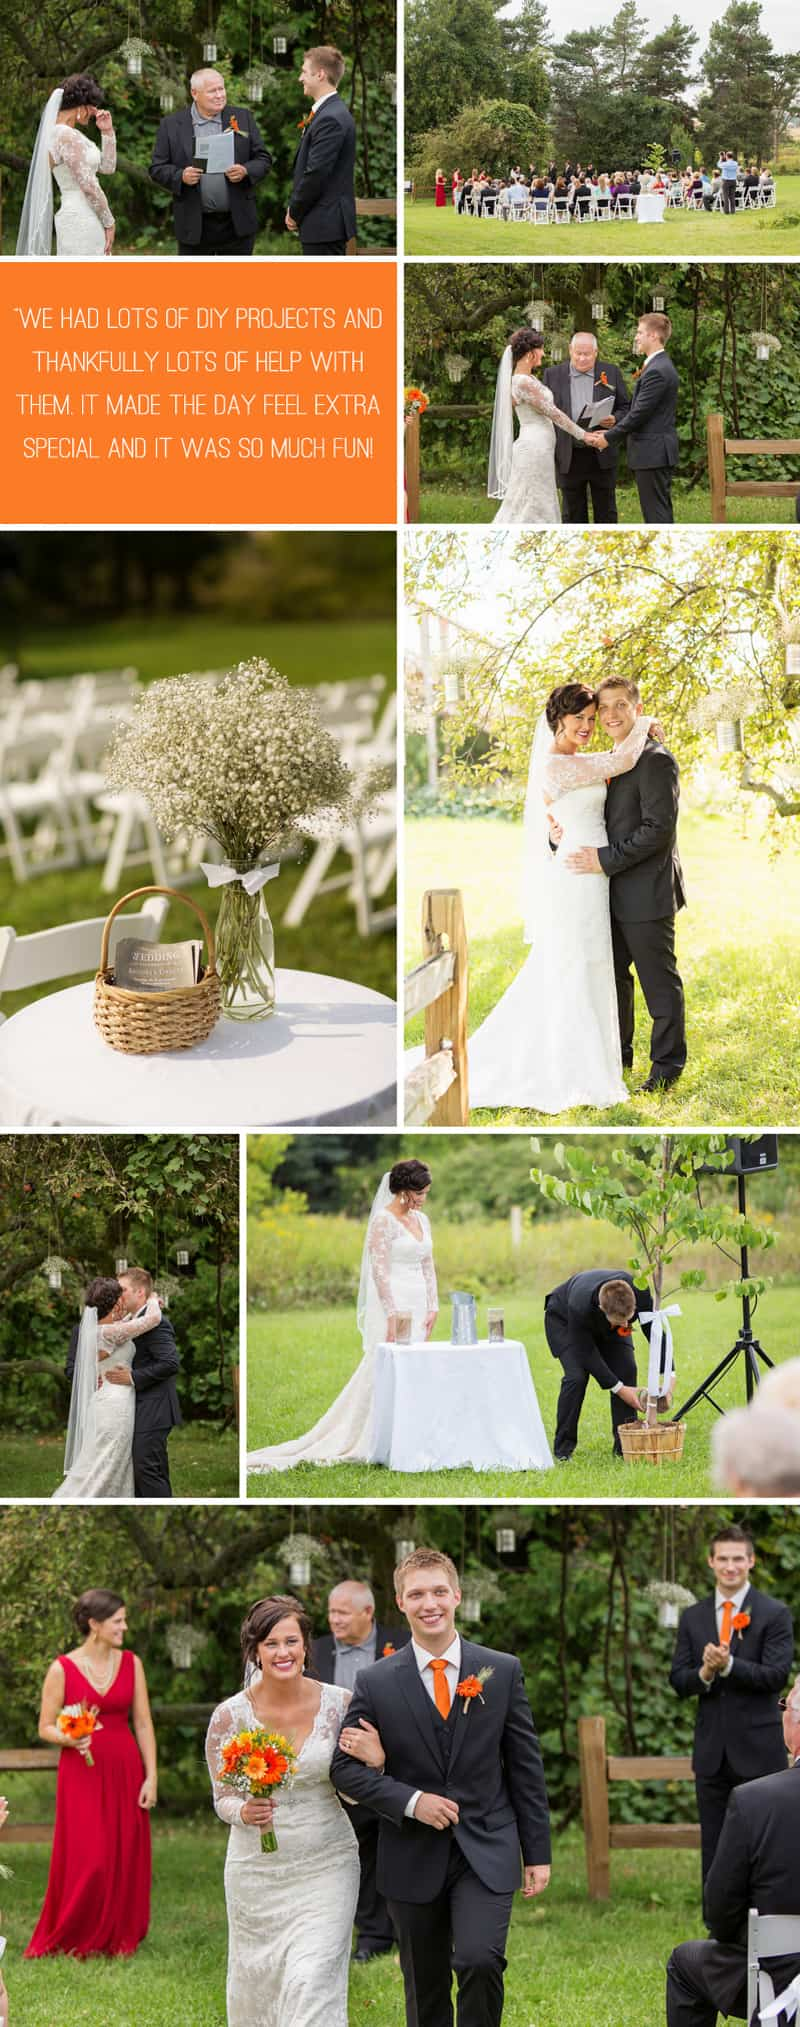 A Romantic Fall Wedding in a Rustic Barn 3